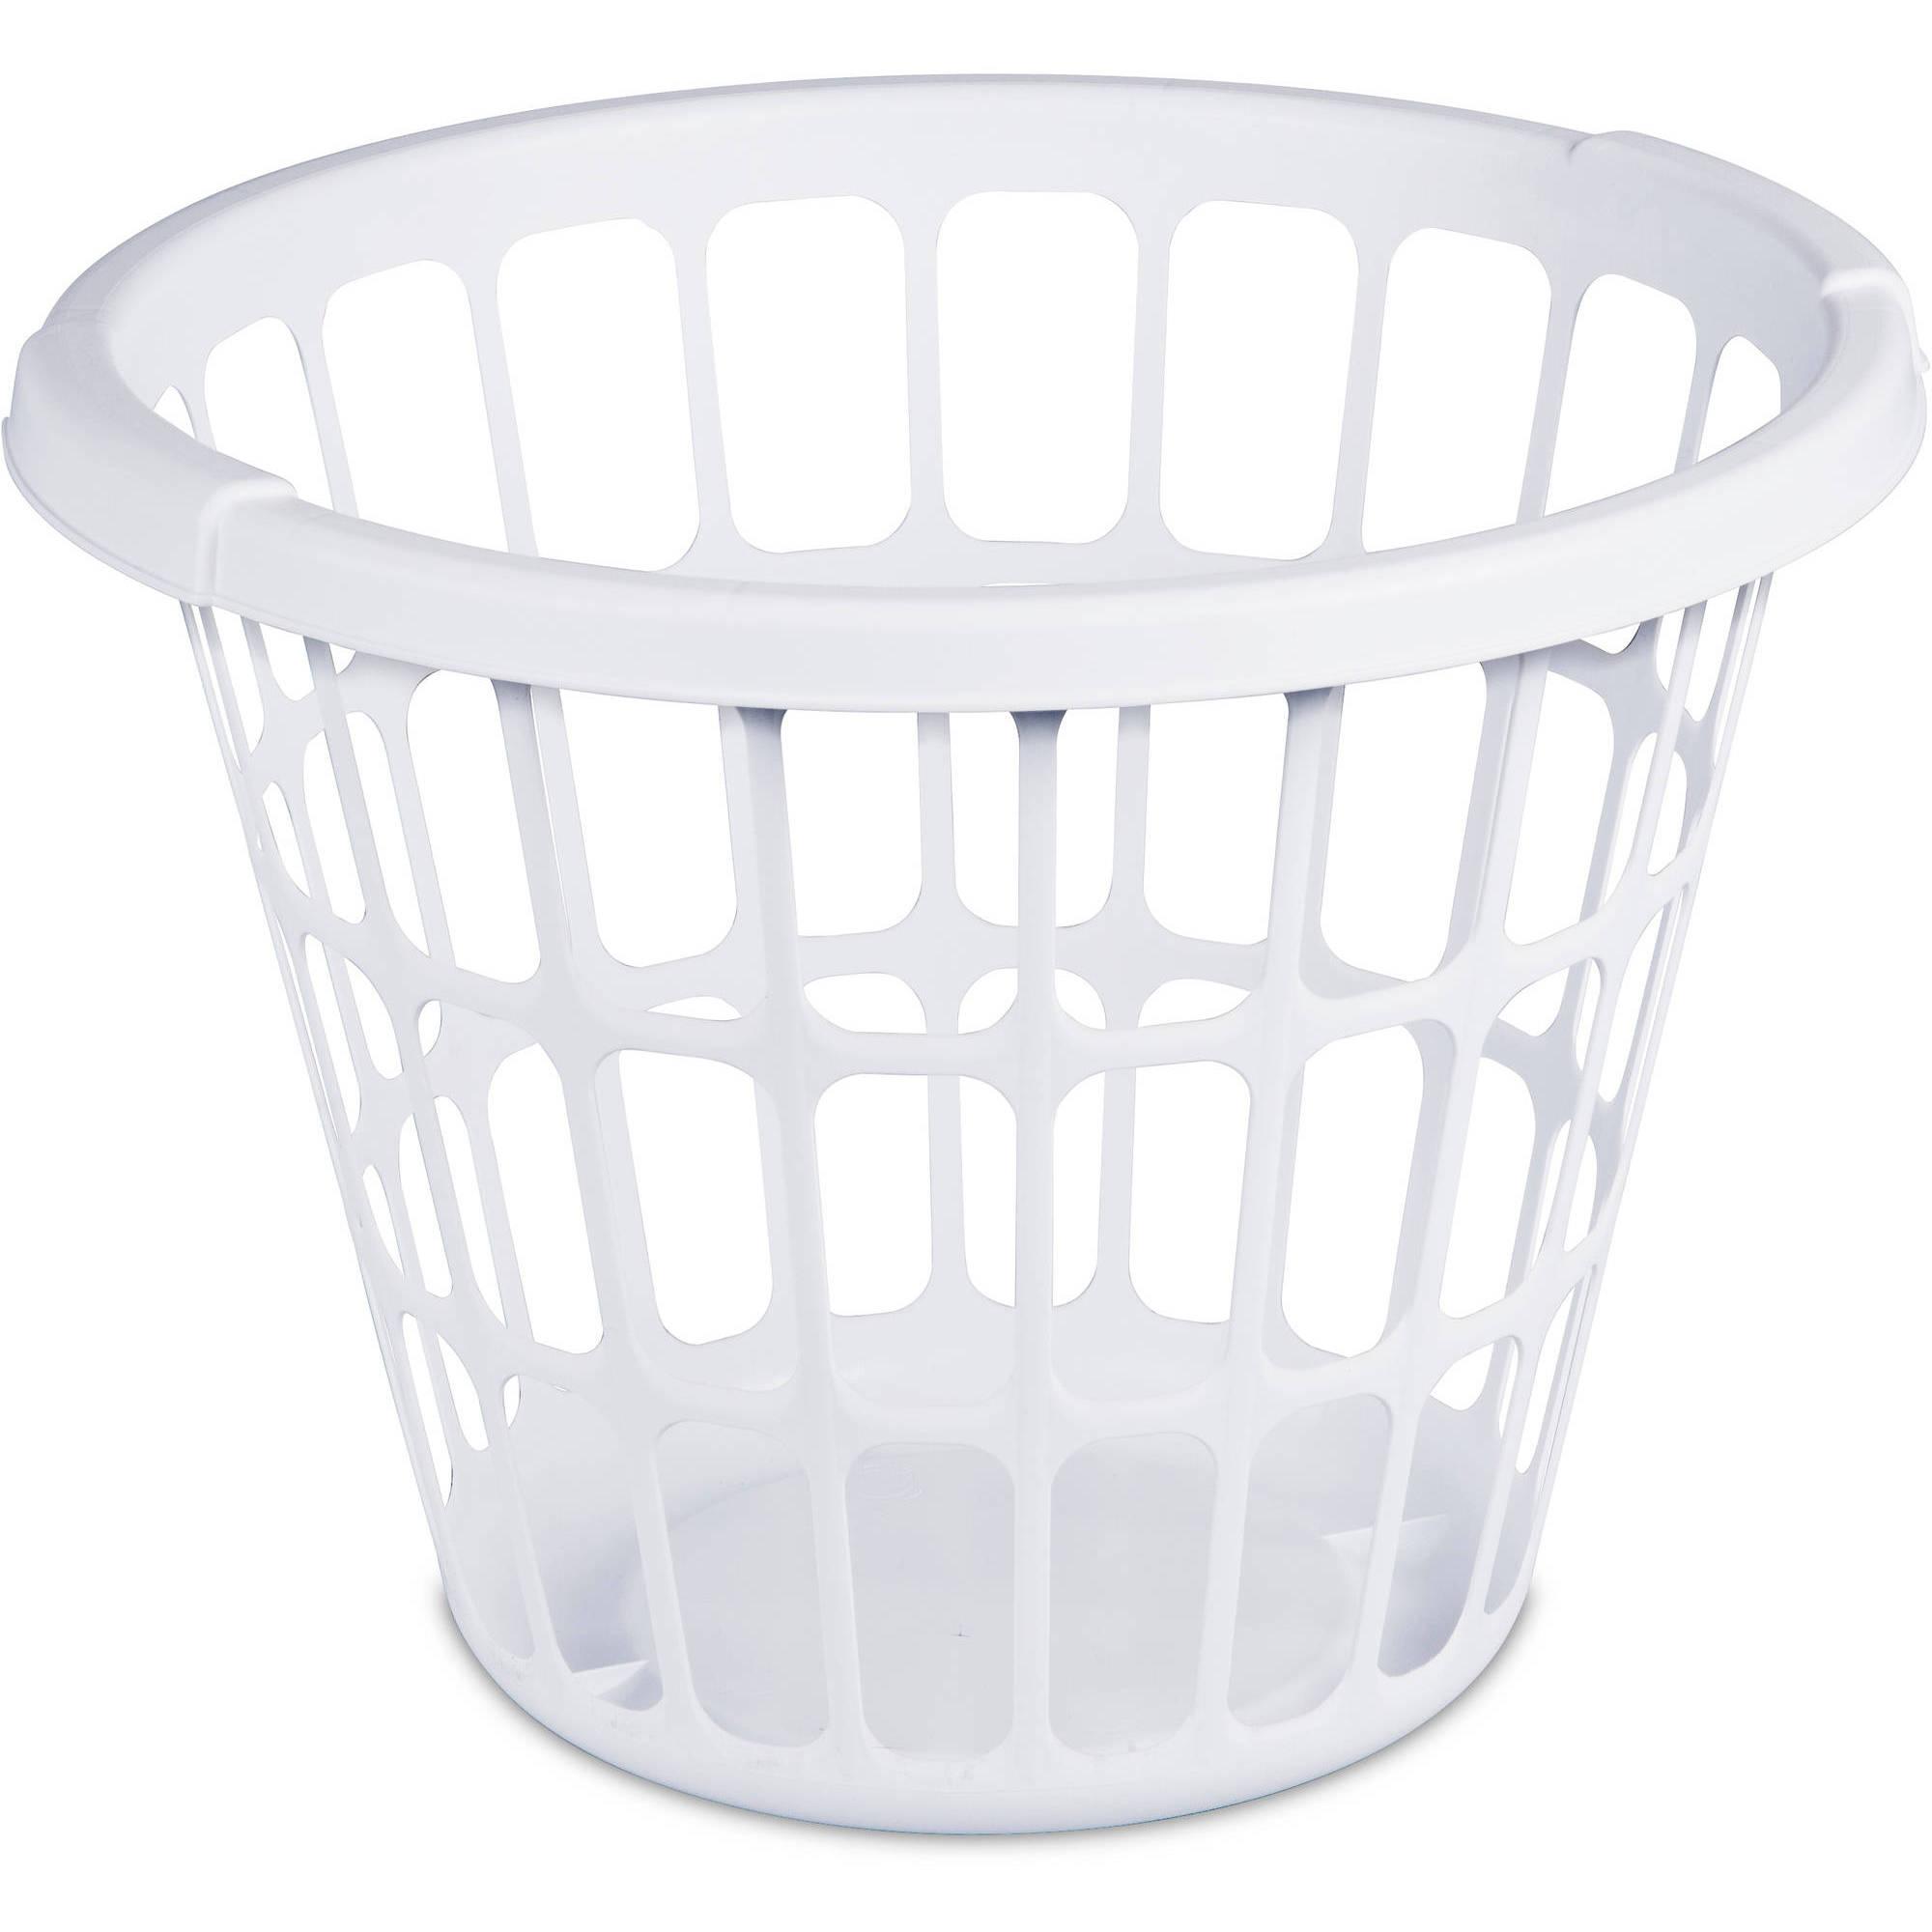 Mainstays 1 Bushel Laundry Basket- White, (Available in Case of 12 or Single Unit)